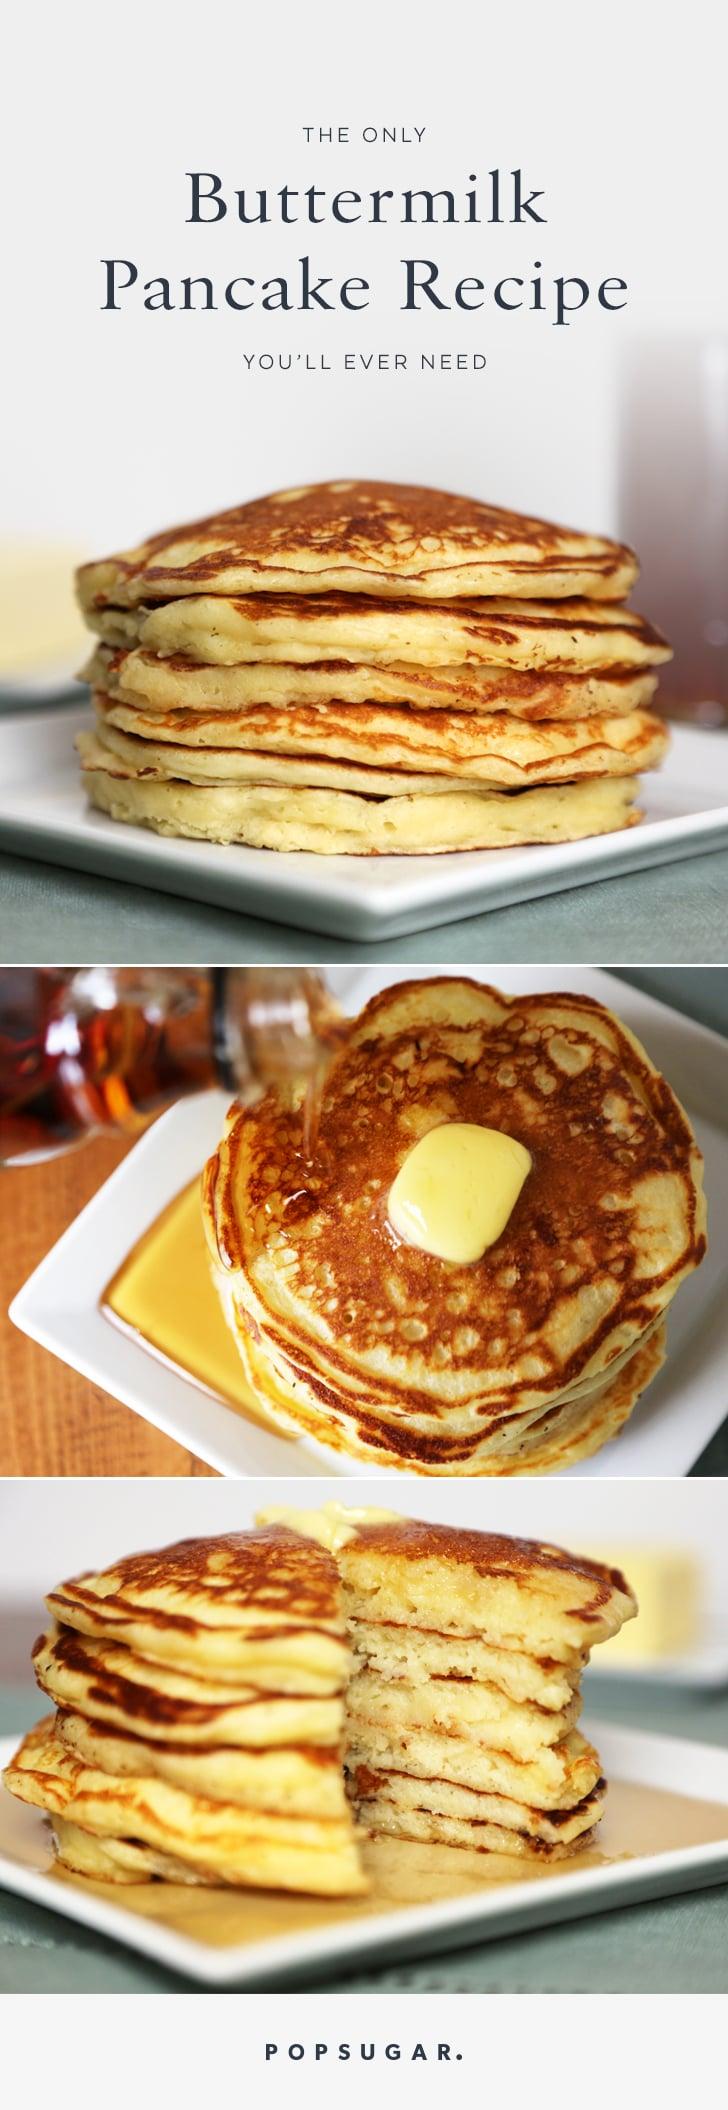 Buttermilk pancake recipe popsugar food ccuart Image collections